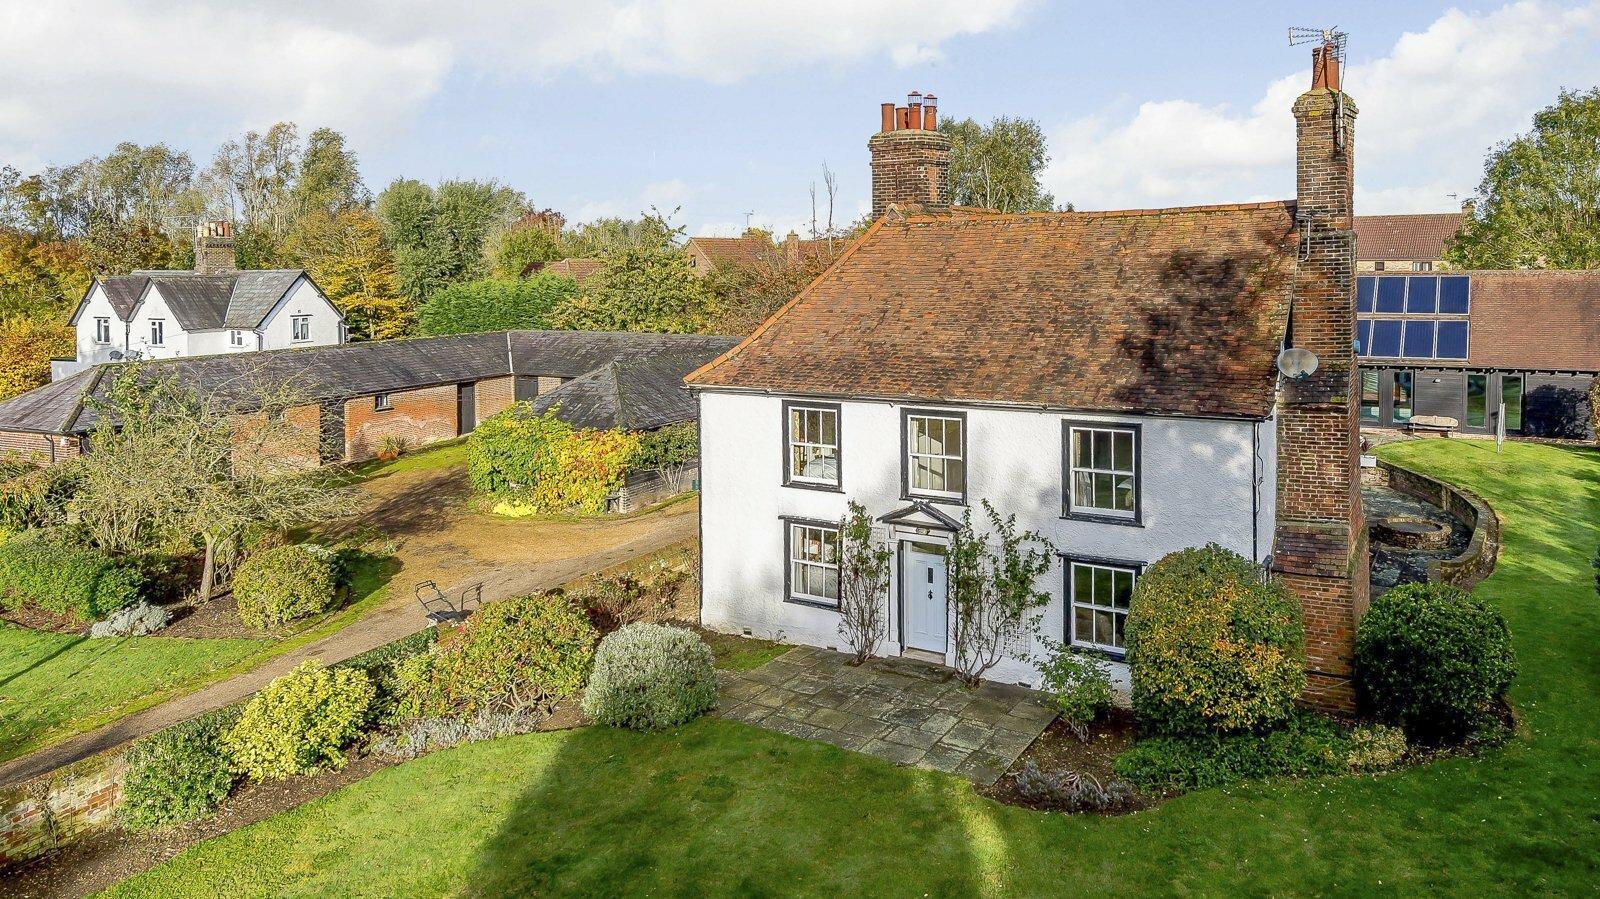 House in Harlow, England, United Kingdom 1